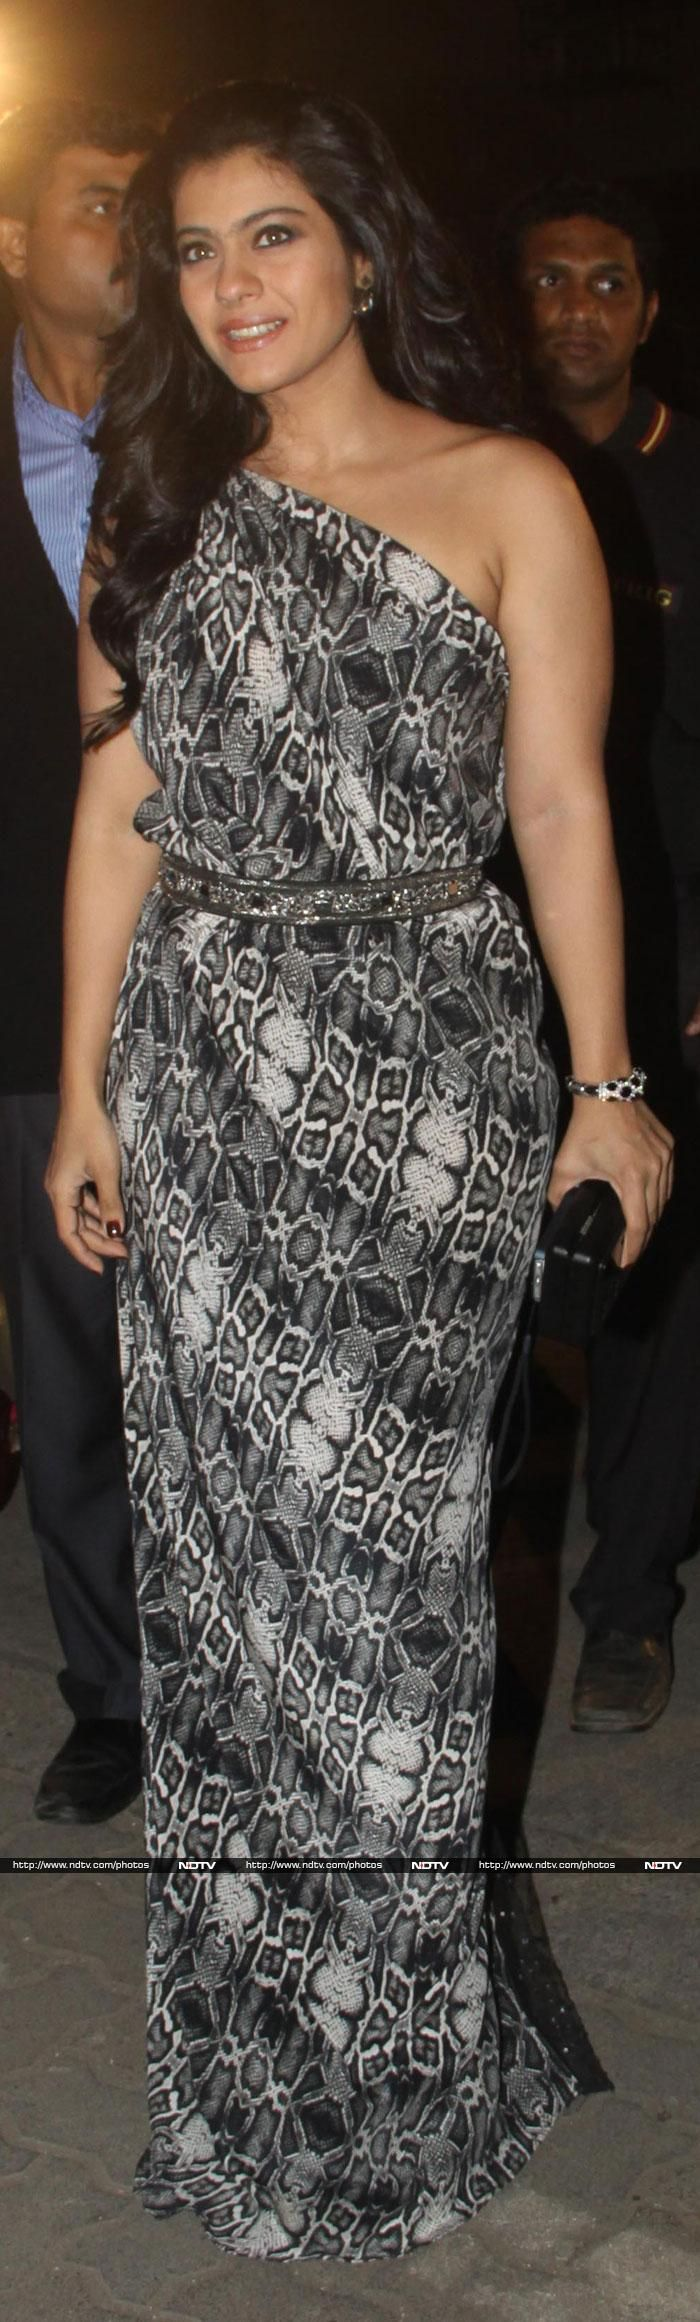 Kajol looked beautiful in a printed Nandita Mahtani gown